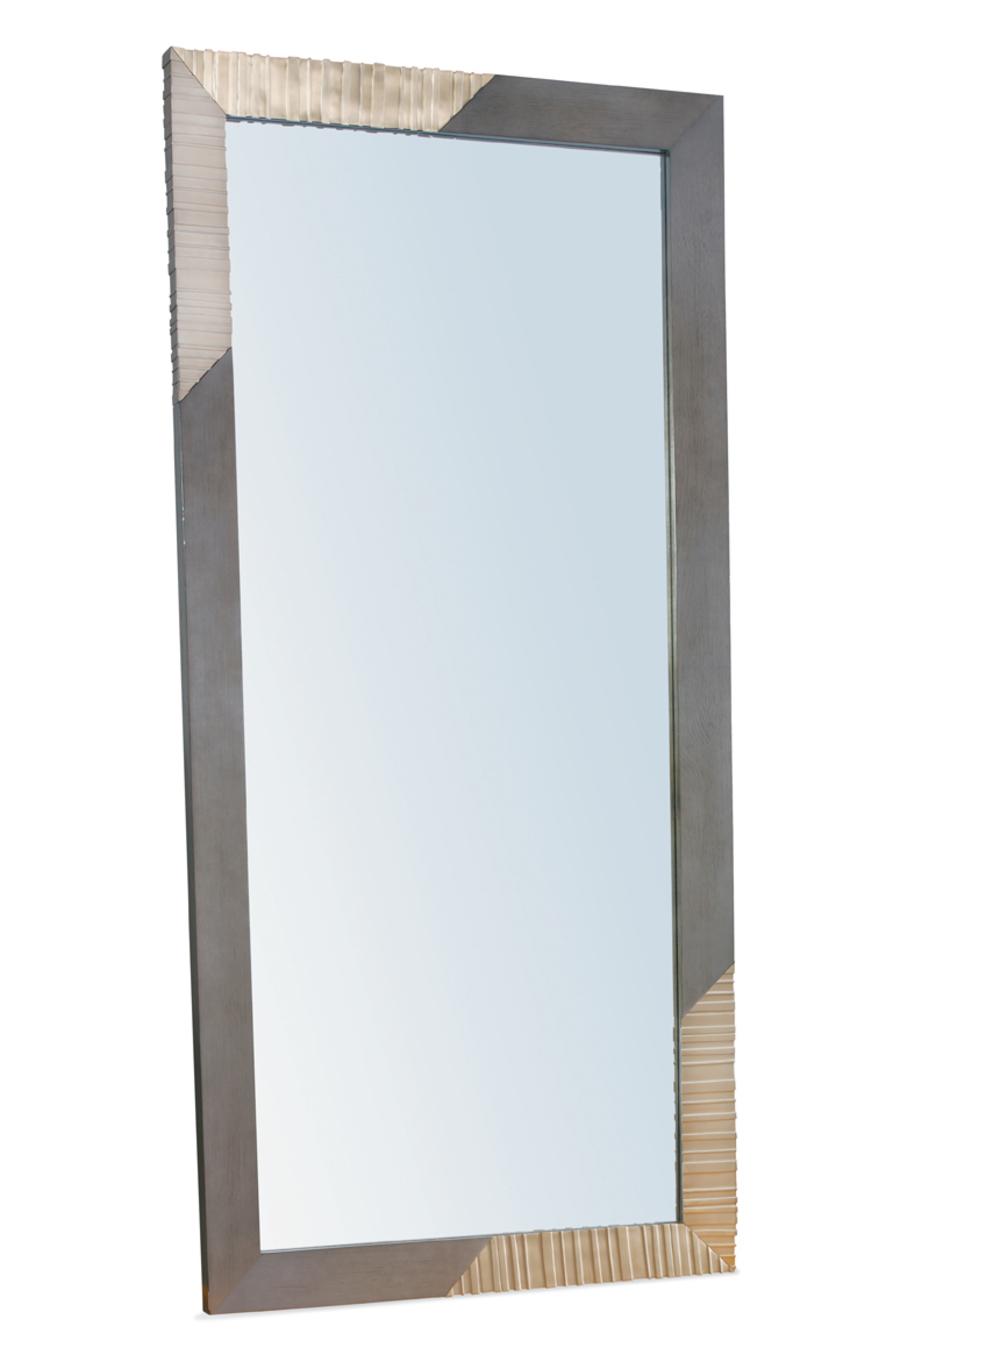 Hickory White - Westfall Grand Mirror